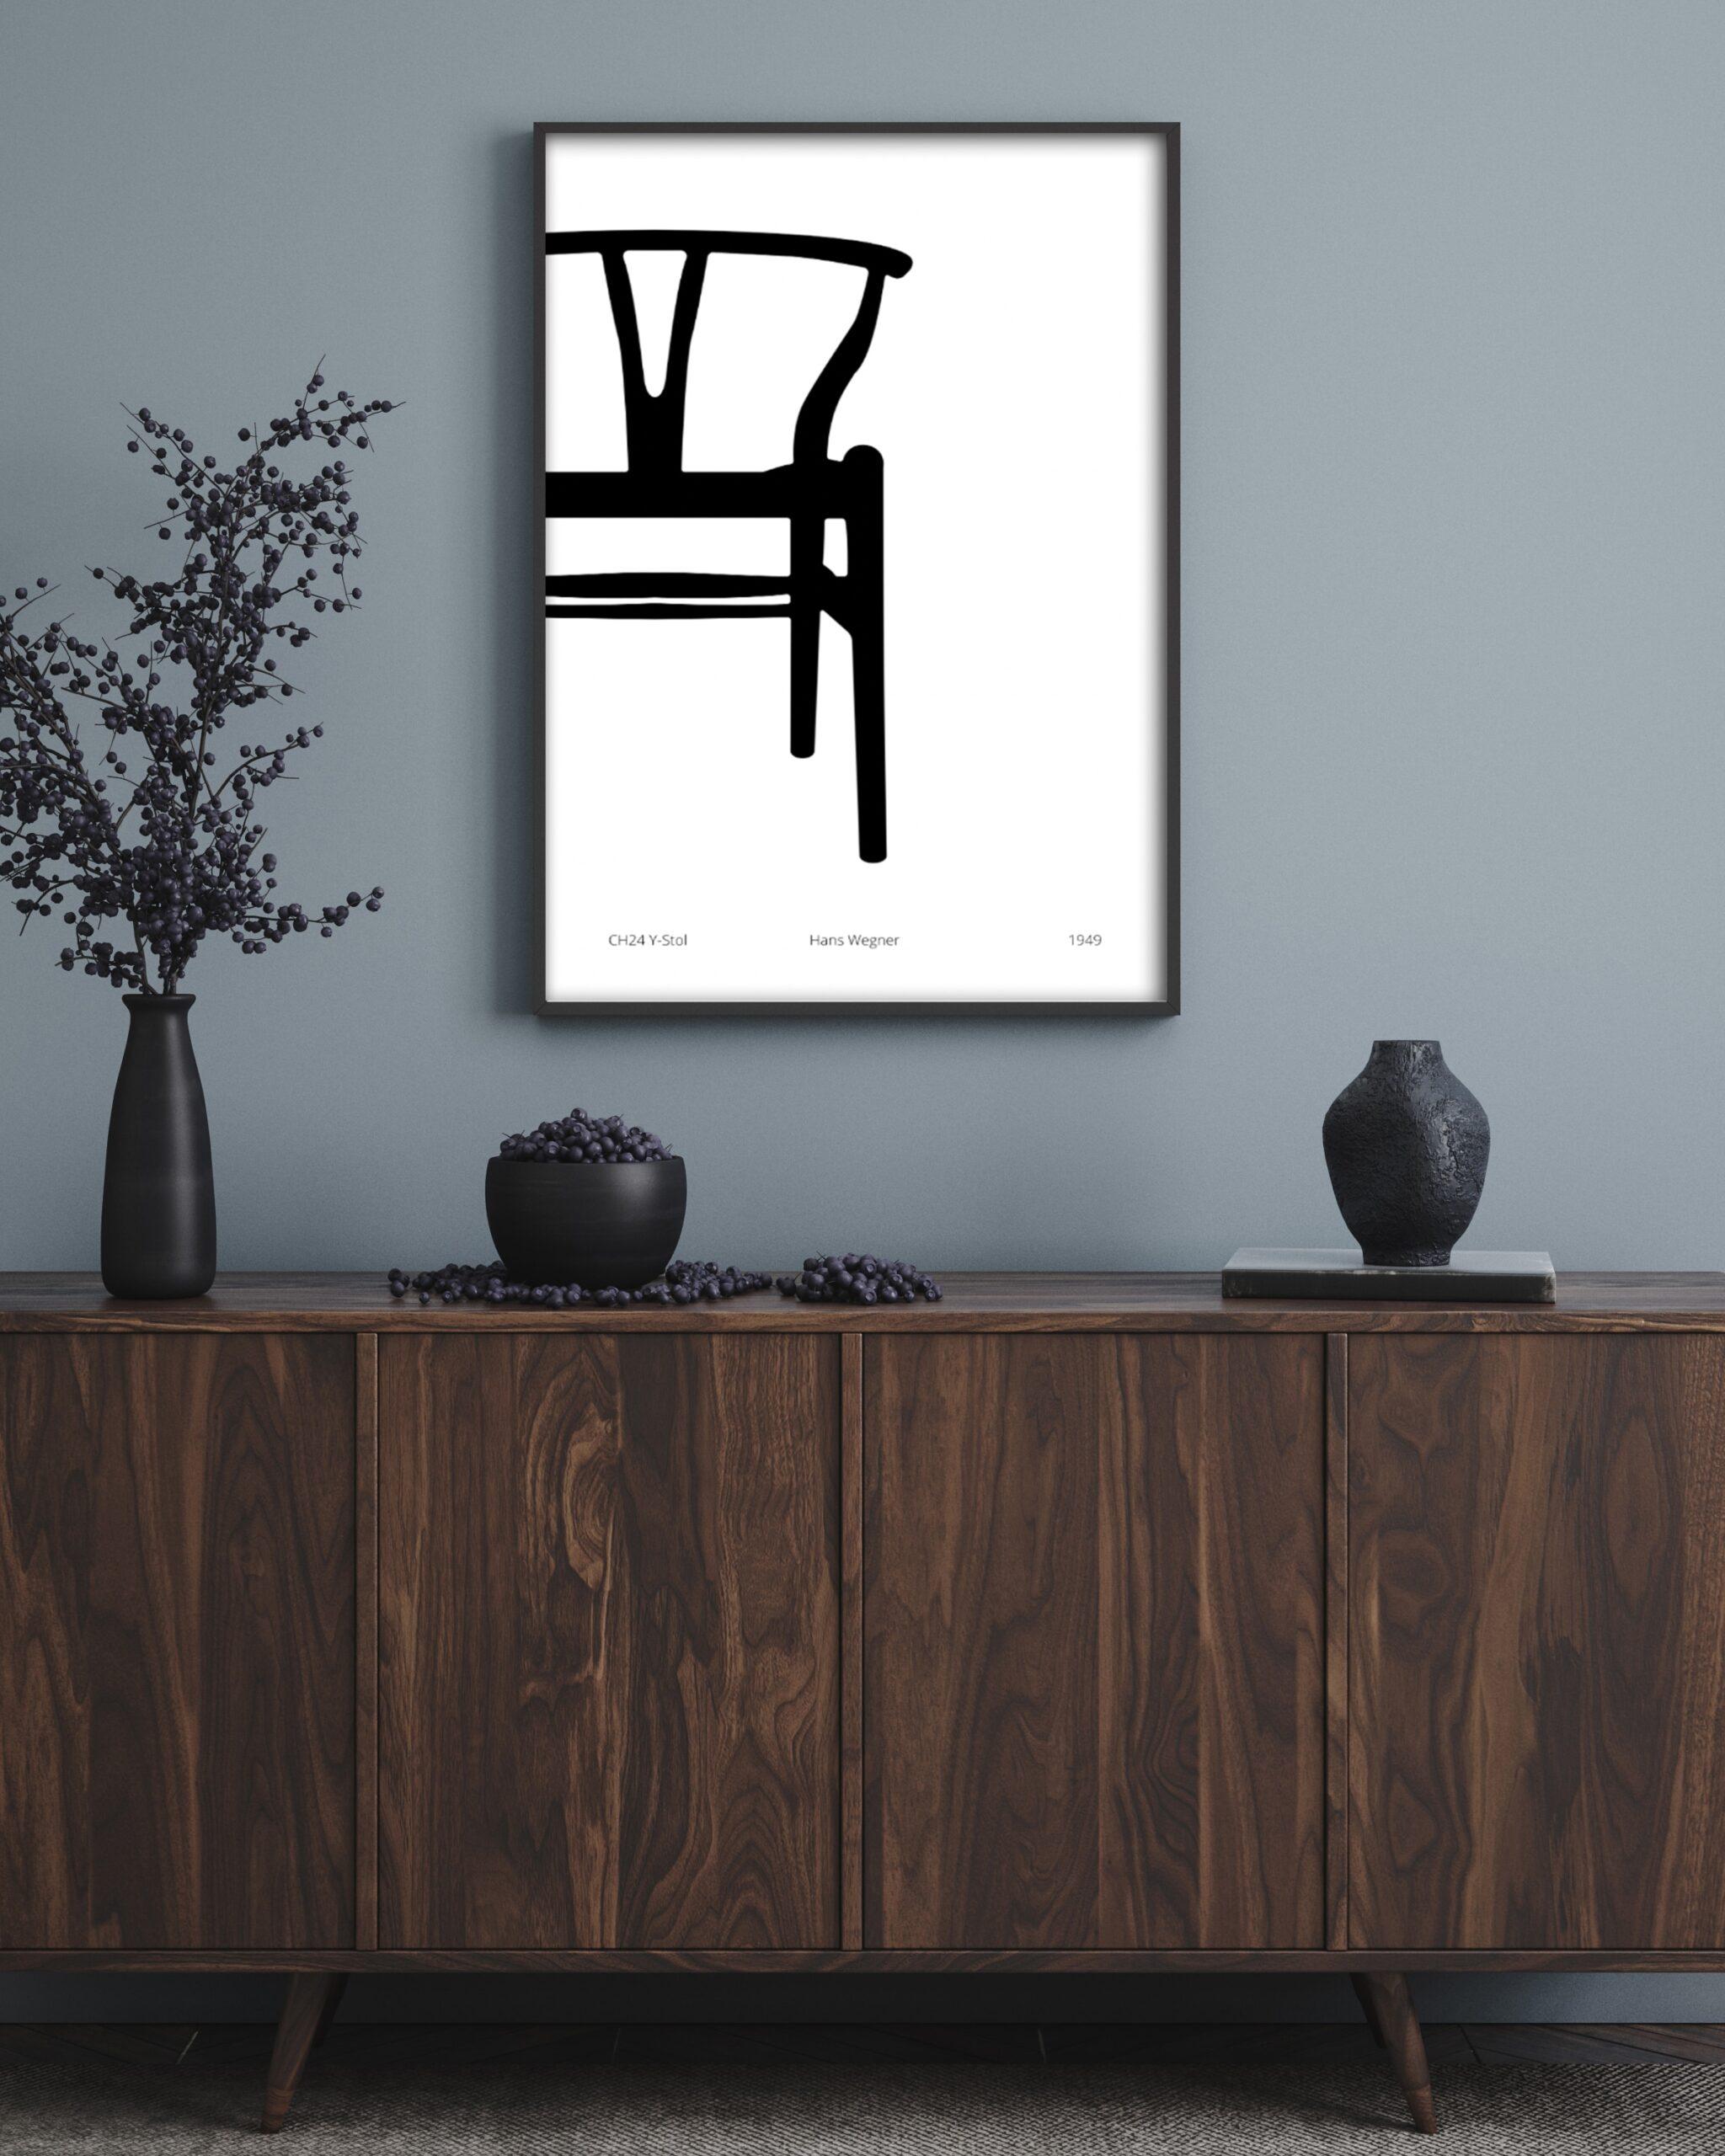 Artsy / artsy svartvita posters